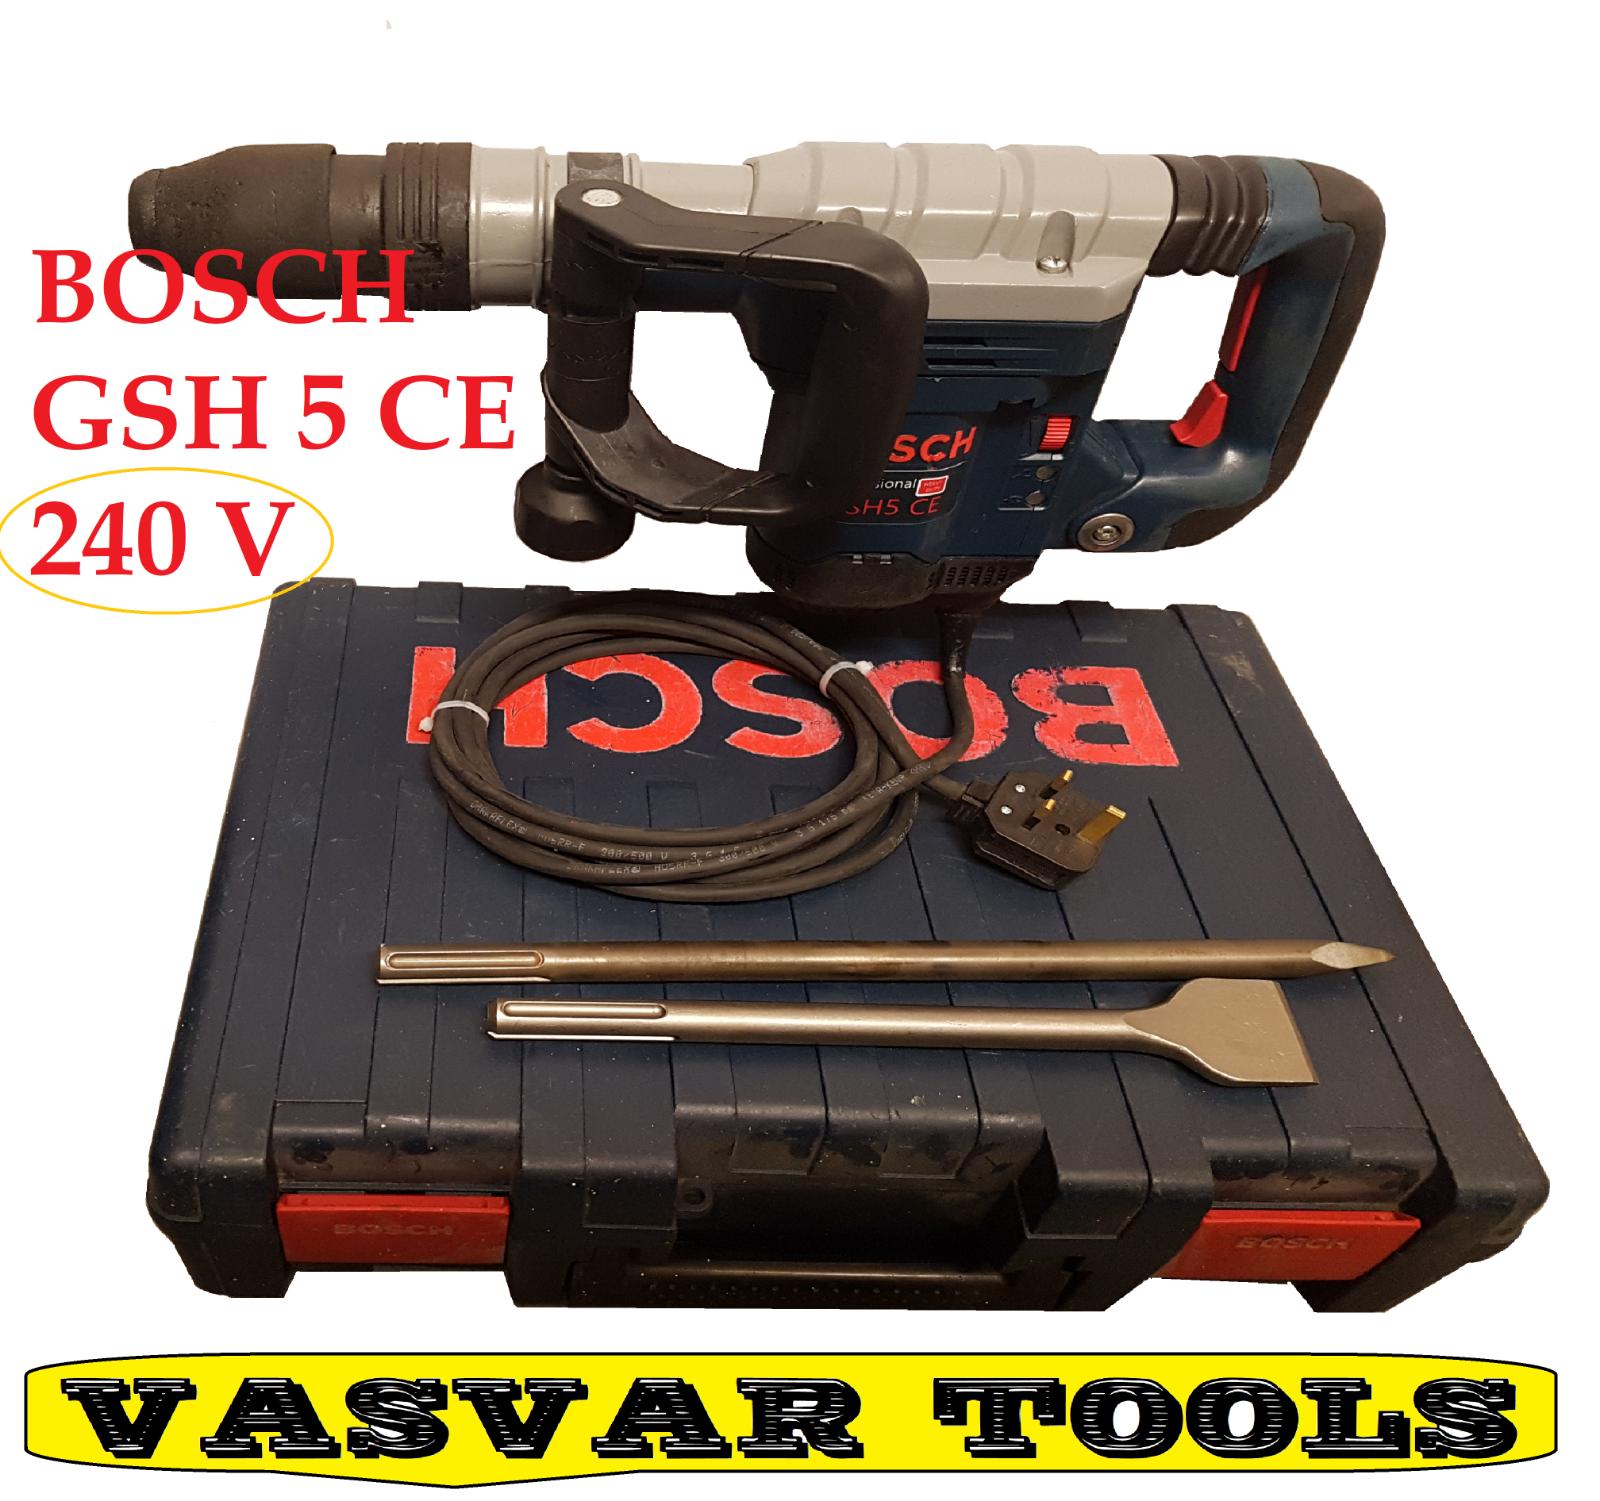 Hammer breaker GSH 5-E 0 611 318 741 demolition HAMMER 240V